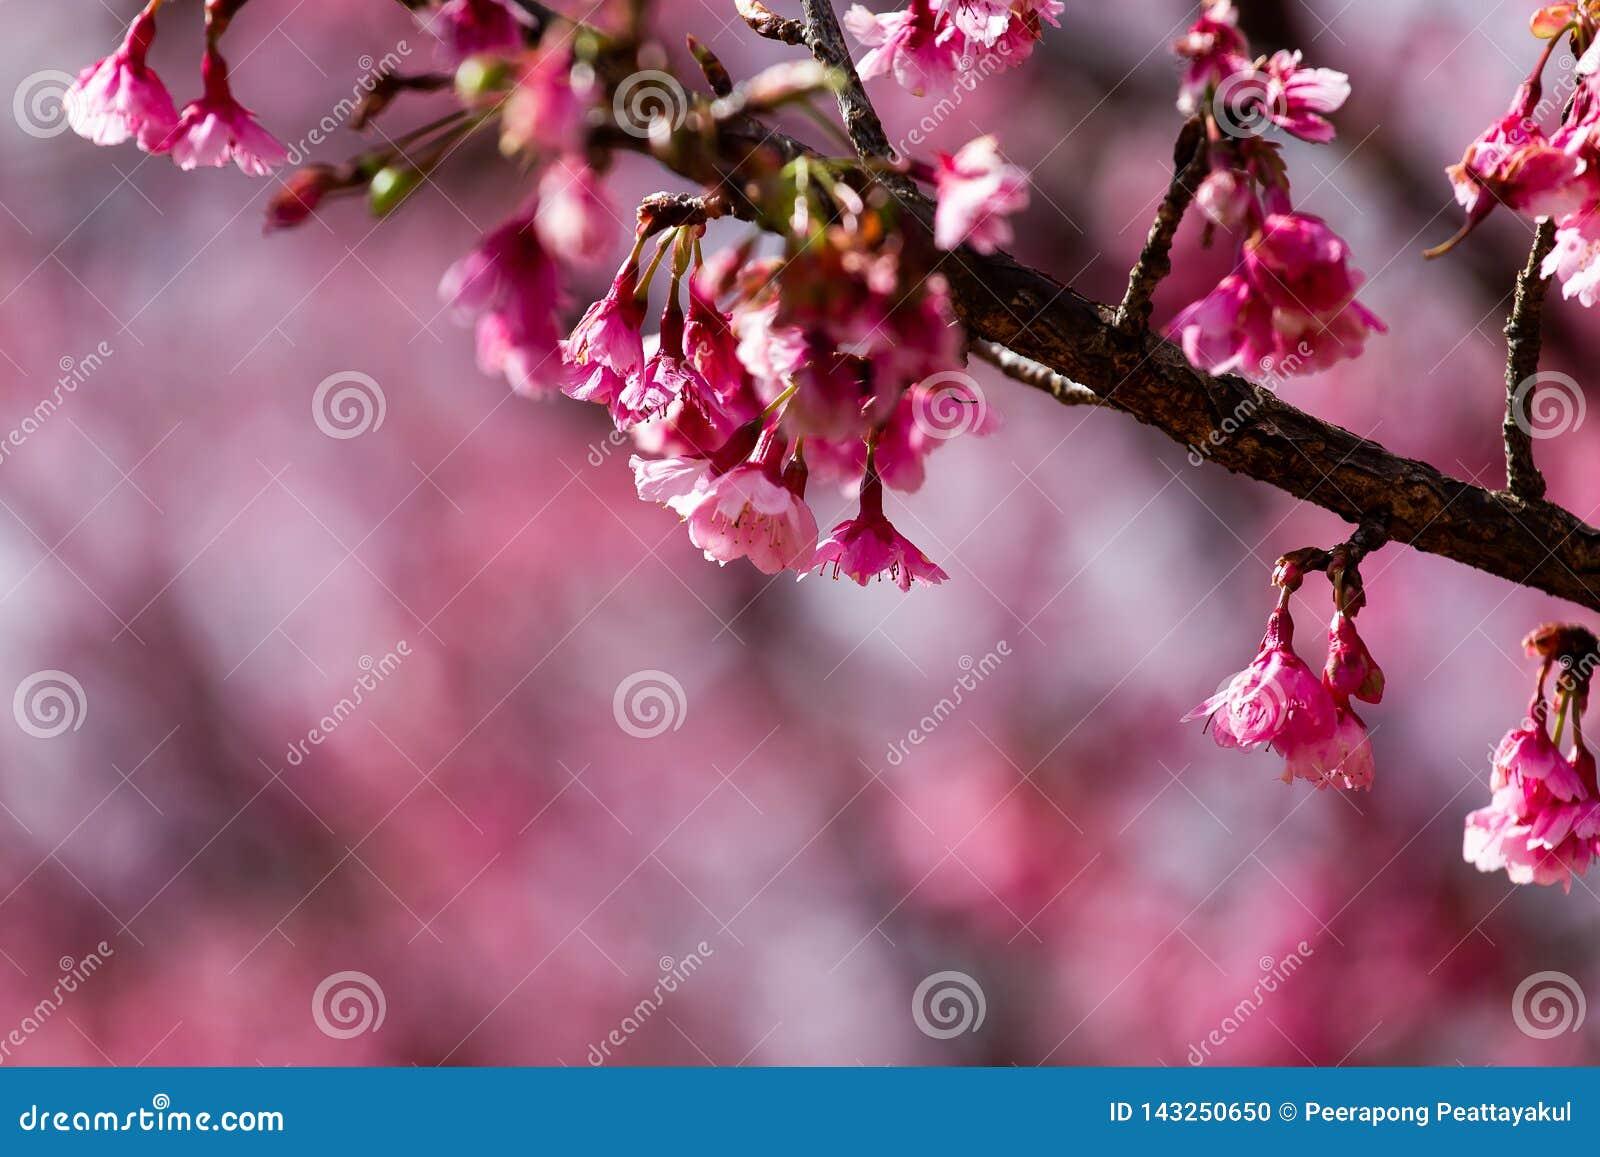 Cherry Blossom And Sakura Wallpaper Stock Photo Image Of